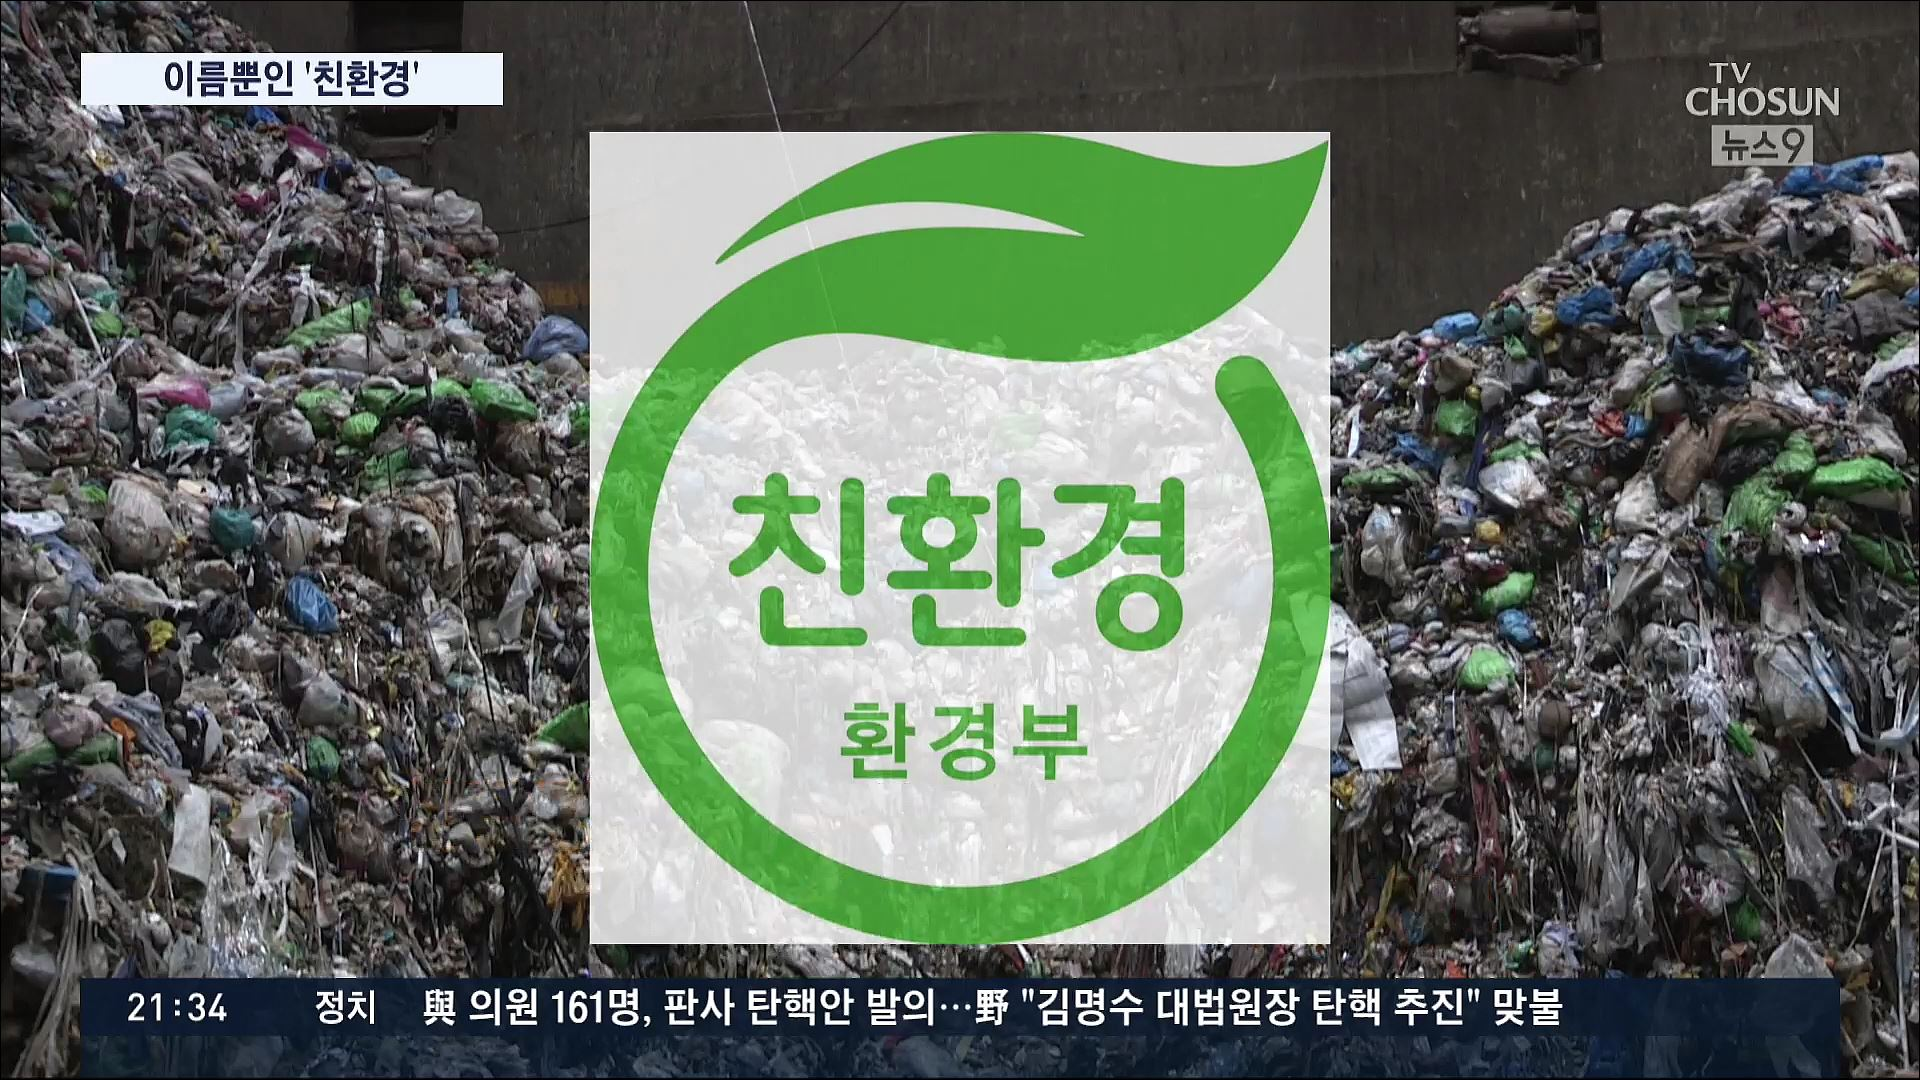 [CSI] '재활용도, 분해도 힘들어'…'이름만' 친환경 제품들